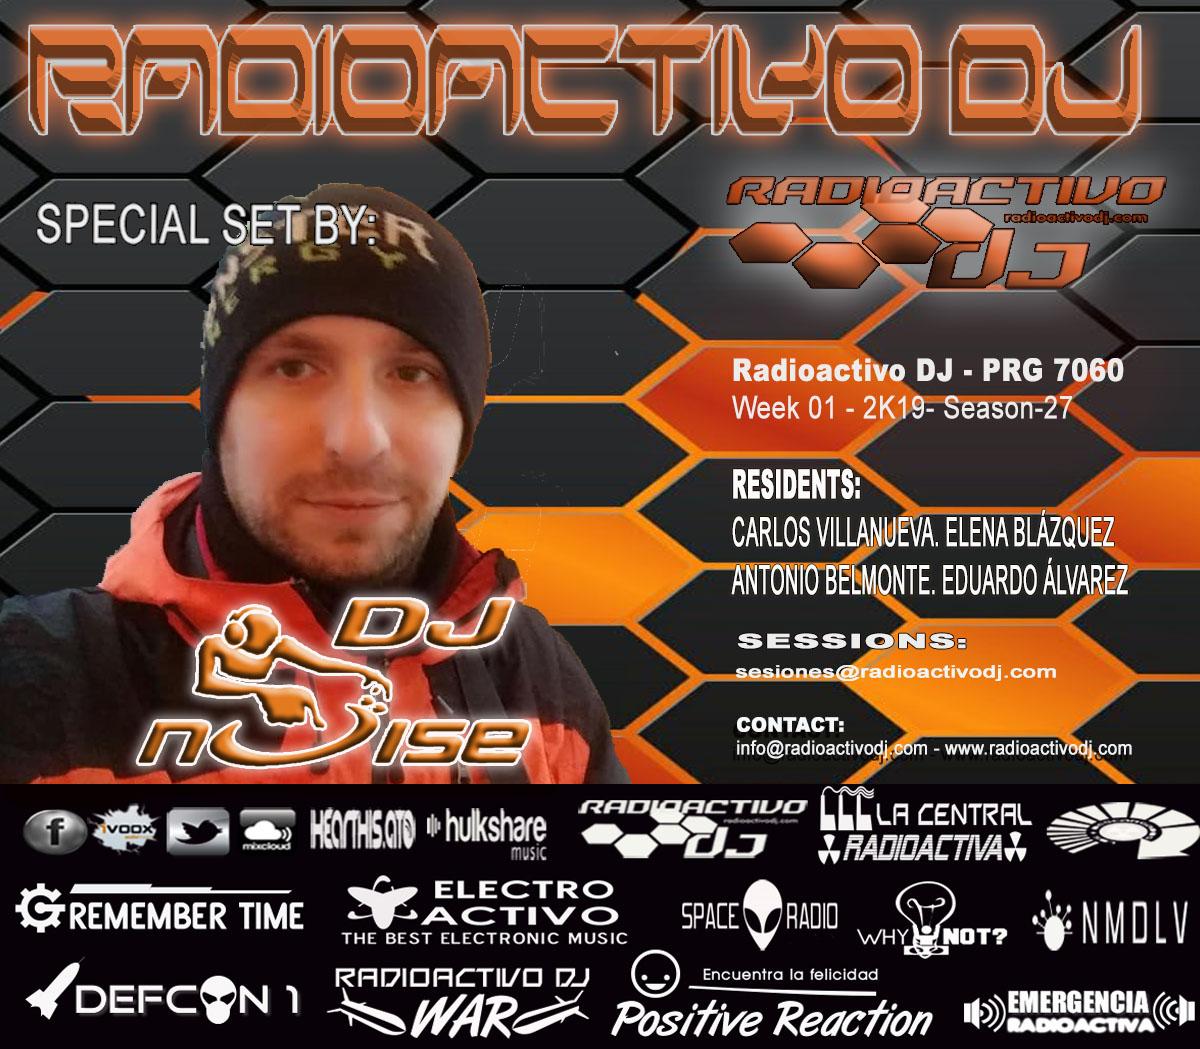 RADIOACTIVO-DJ-02-2019